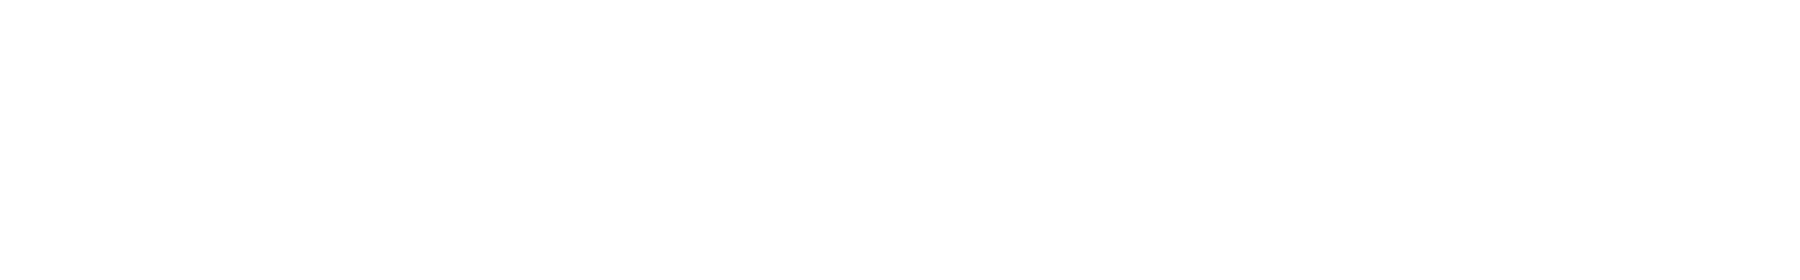 shg percussion loop 21